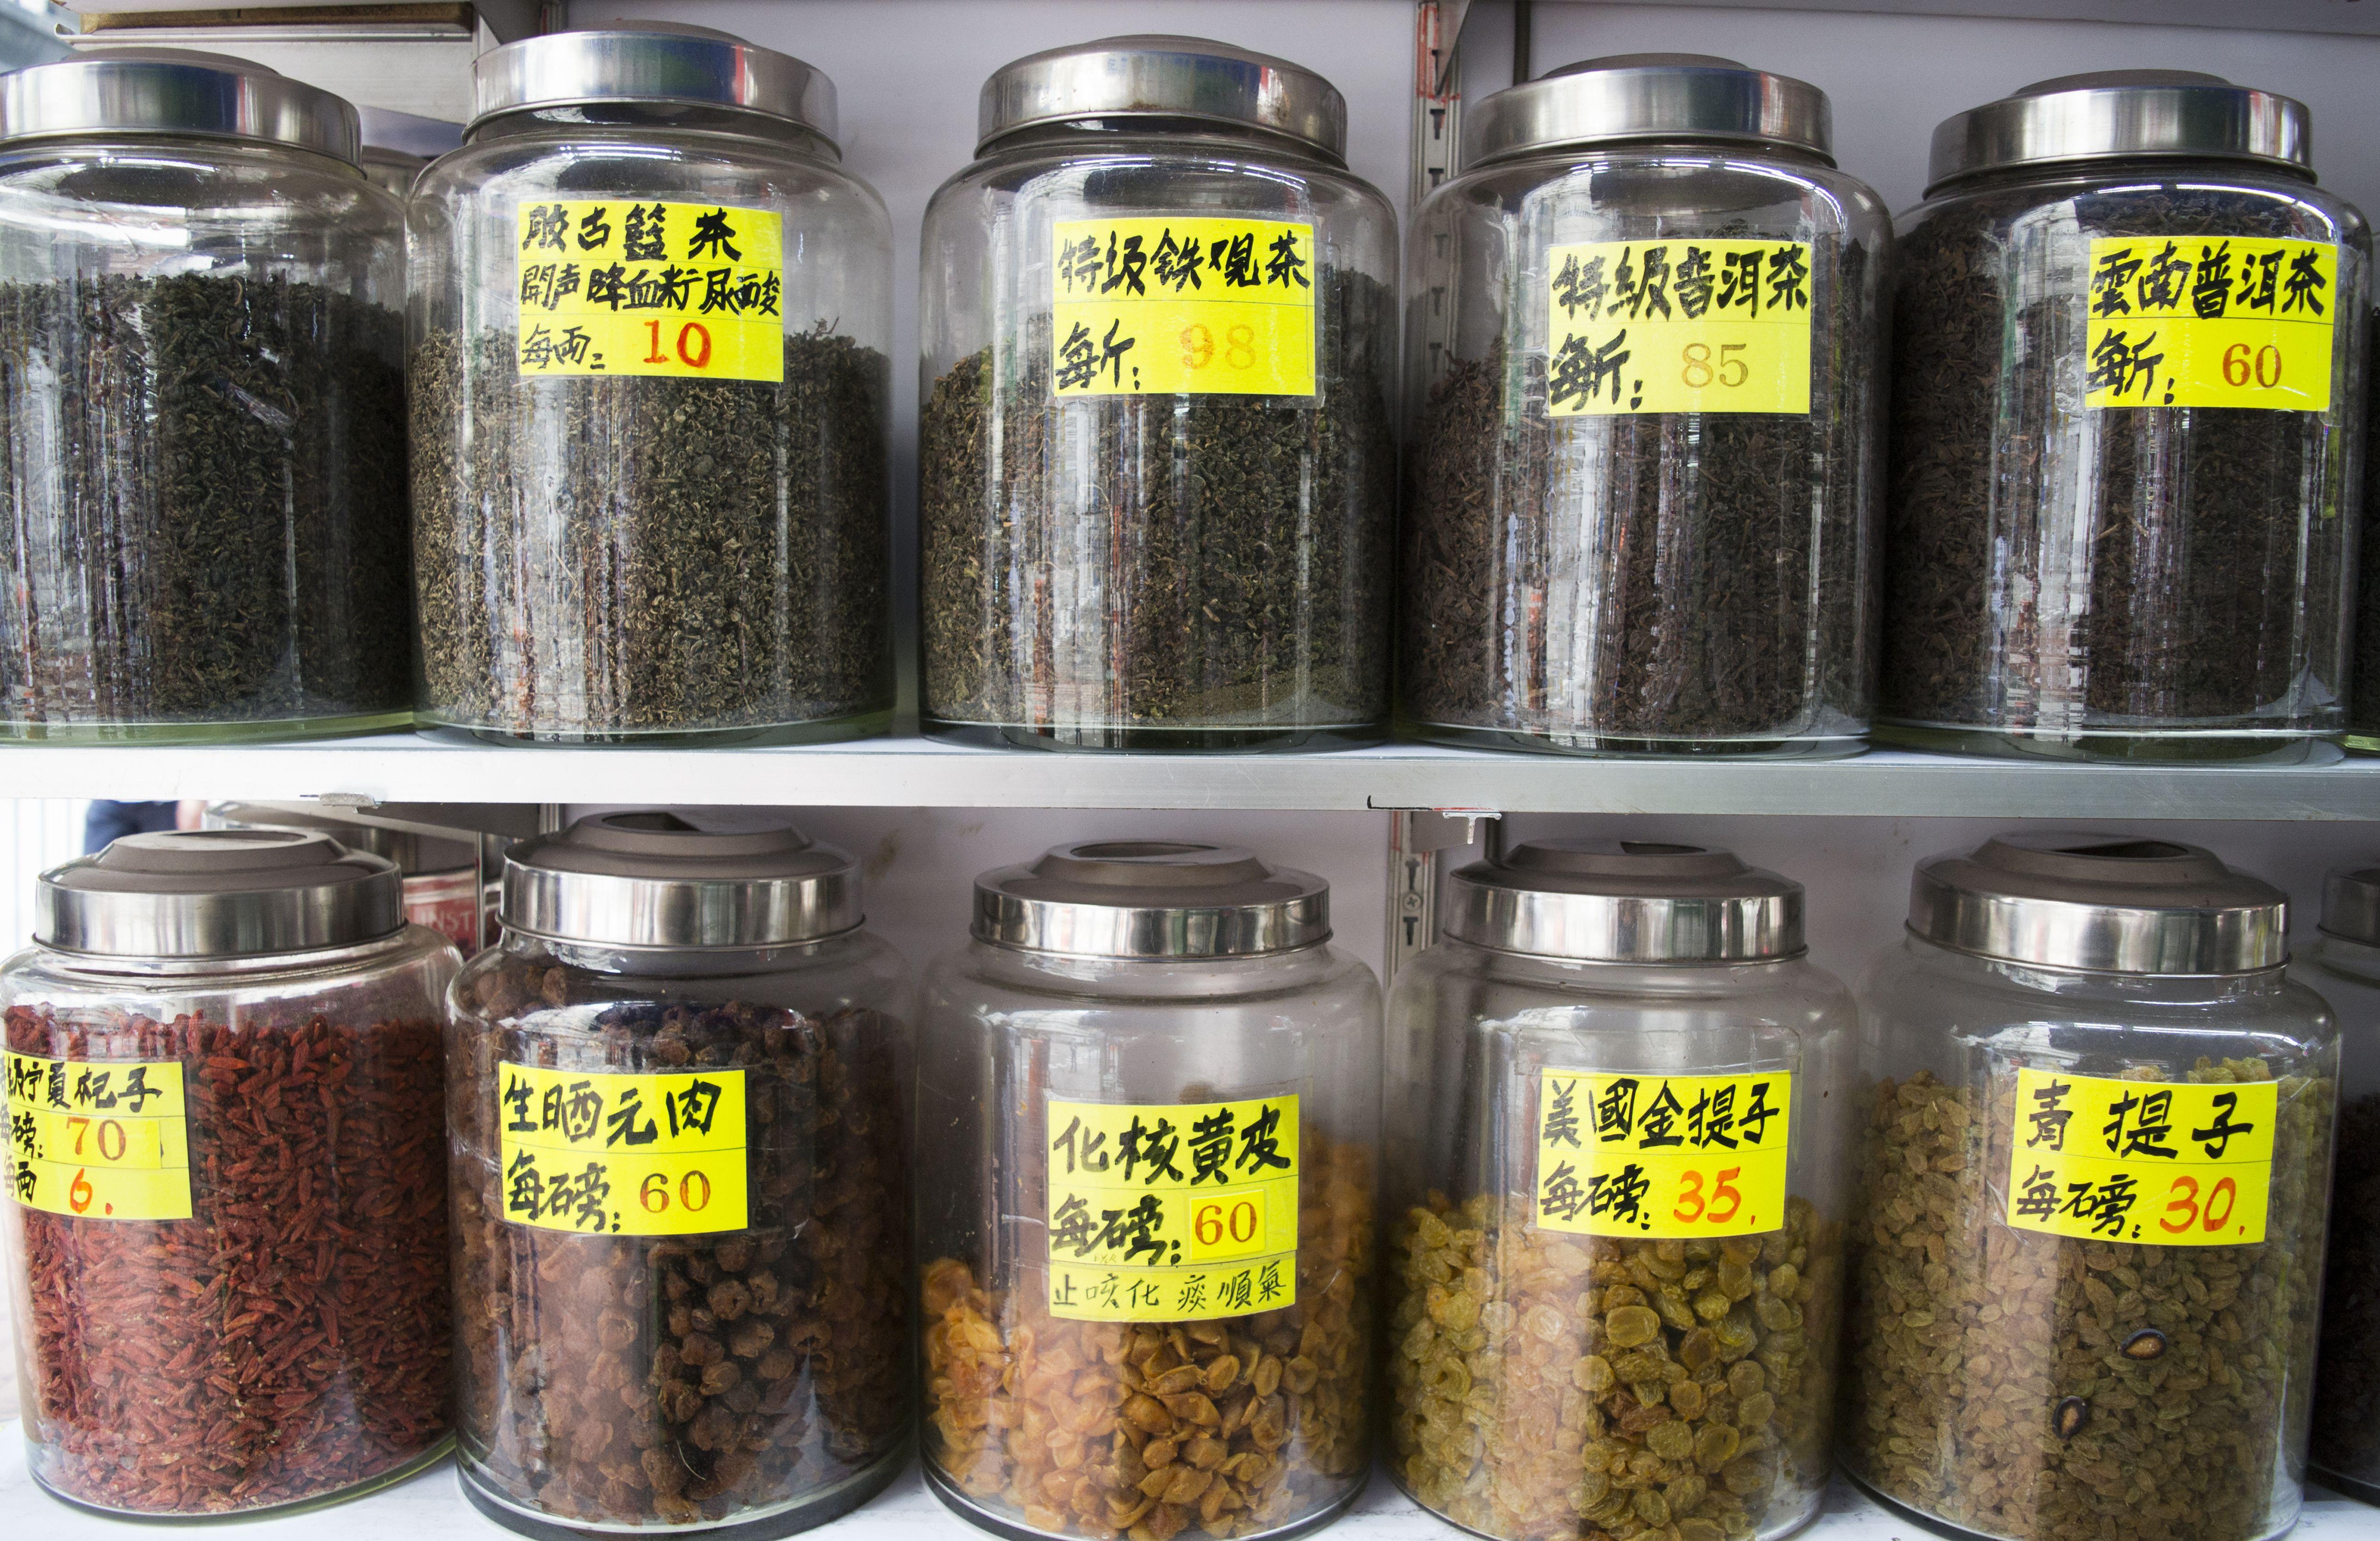 Medicinal teas and herbs on sale in jars